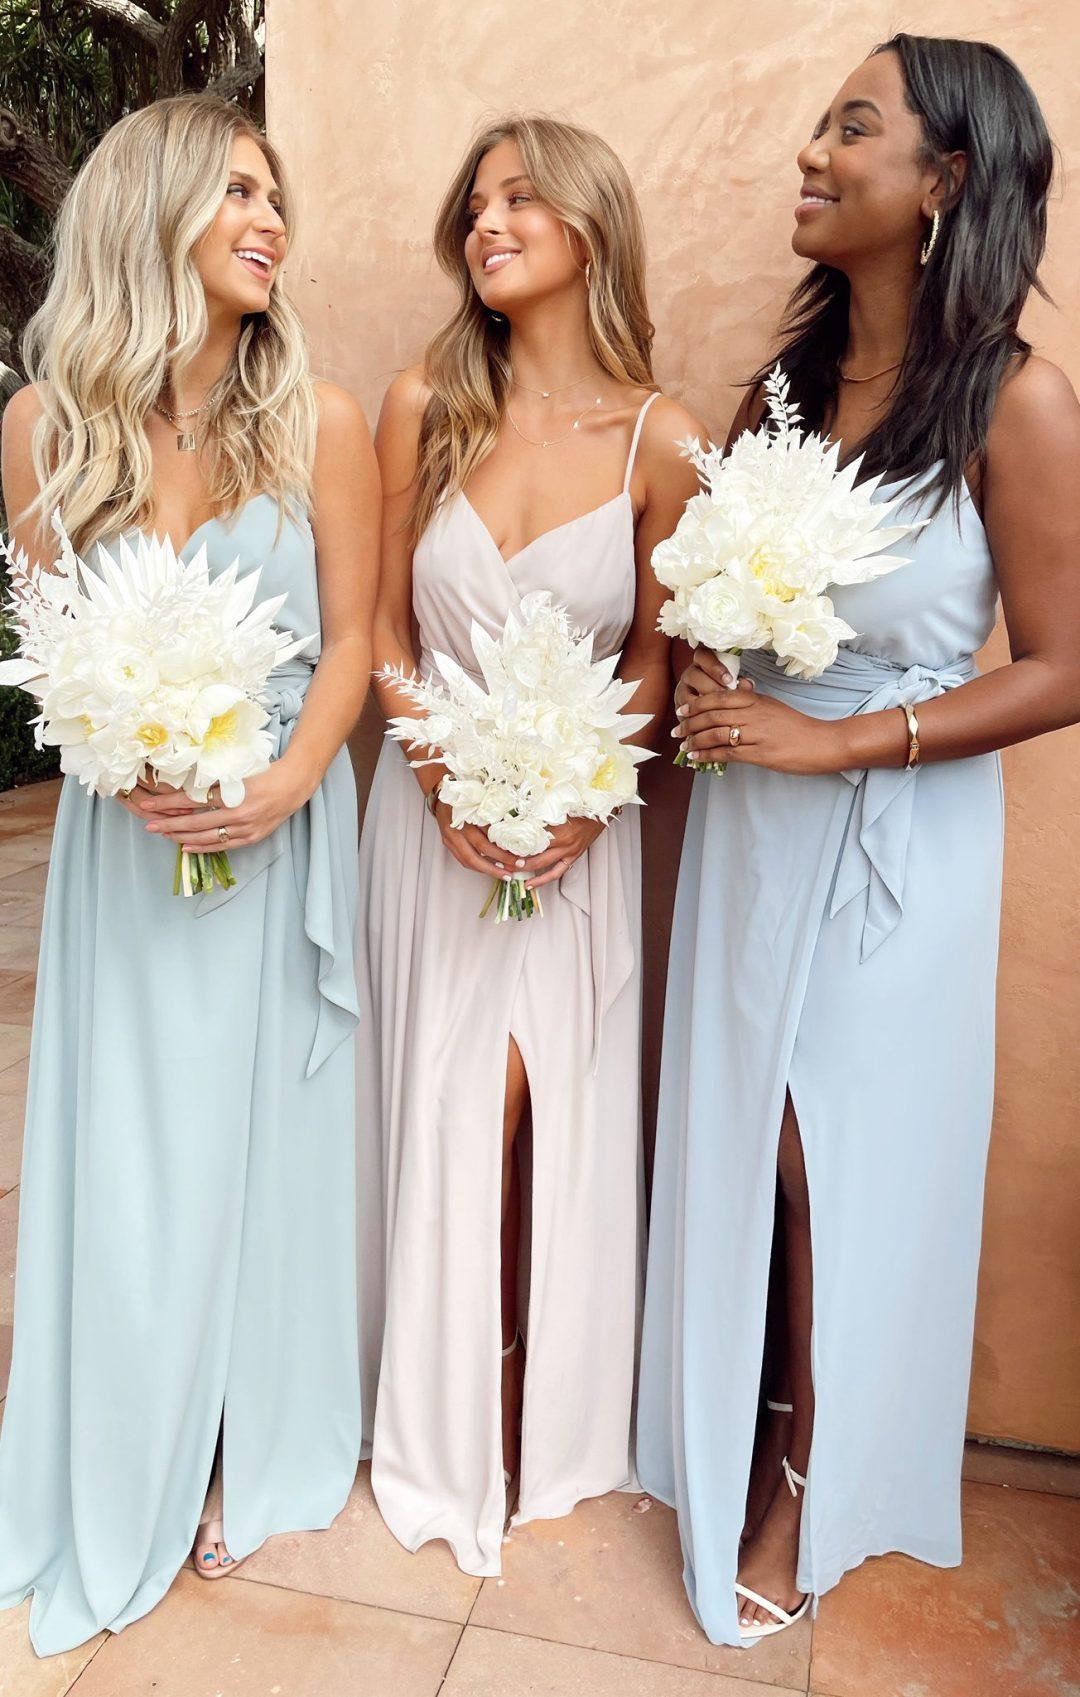 Mismatched pale pink and pale blue bridesmaid dresses